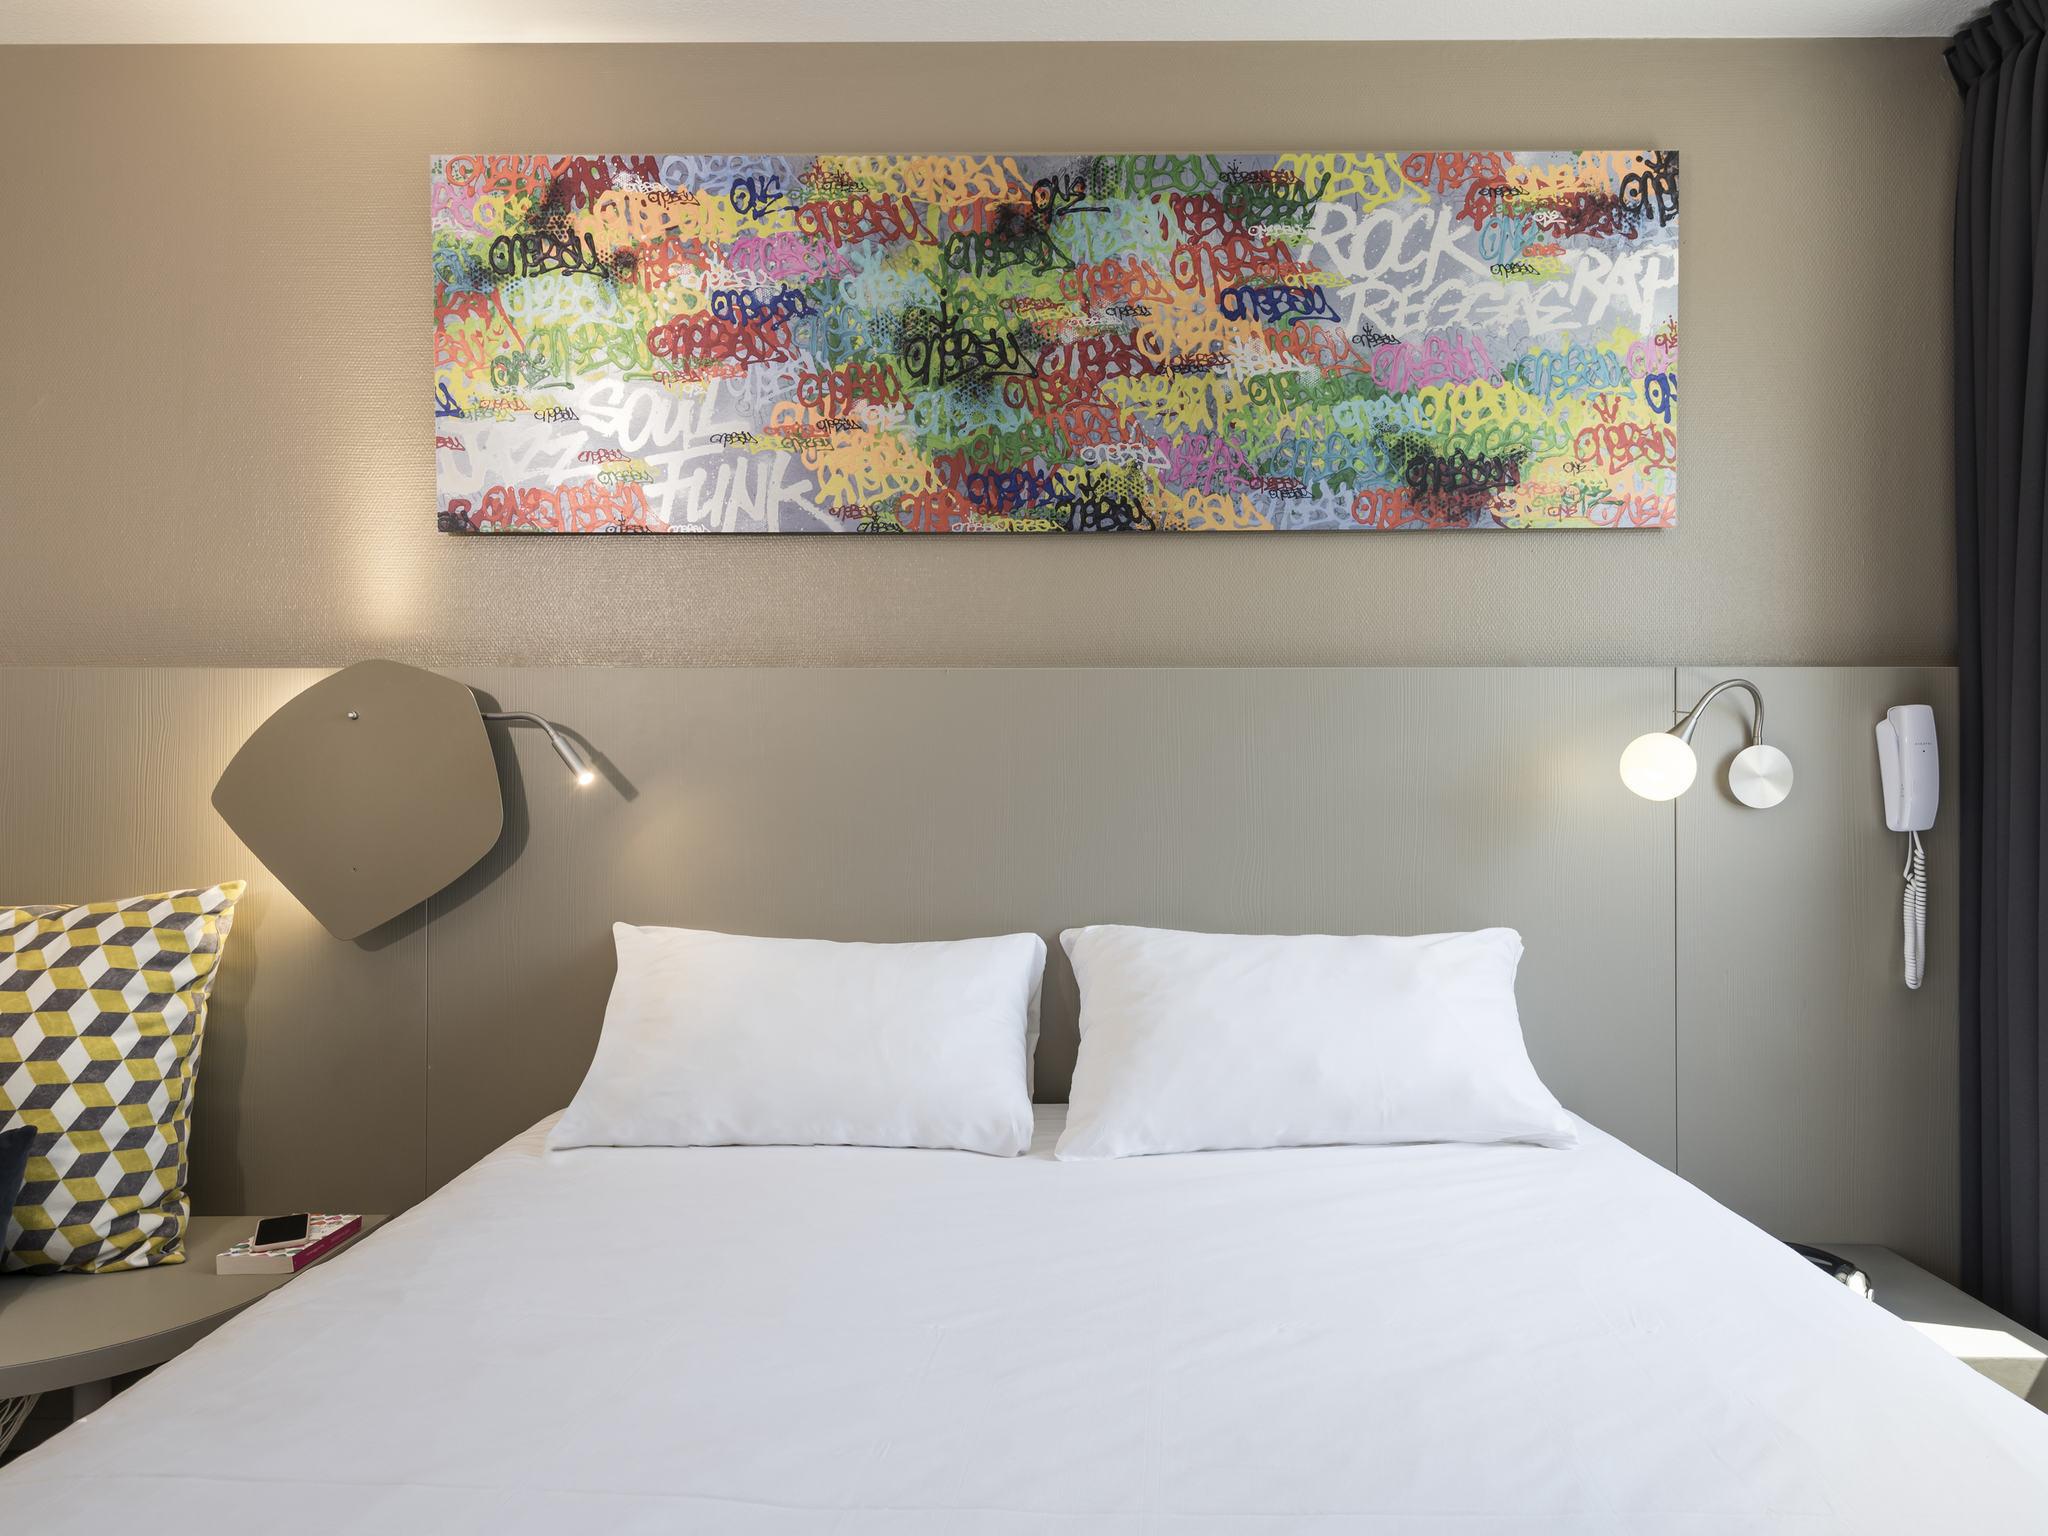 Hotel In Paris Ibis Styles Bercy Kunci Kontak Key Set Verza Rooms